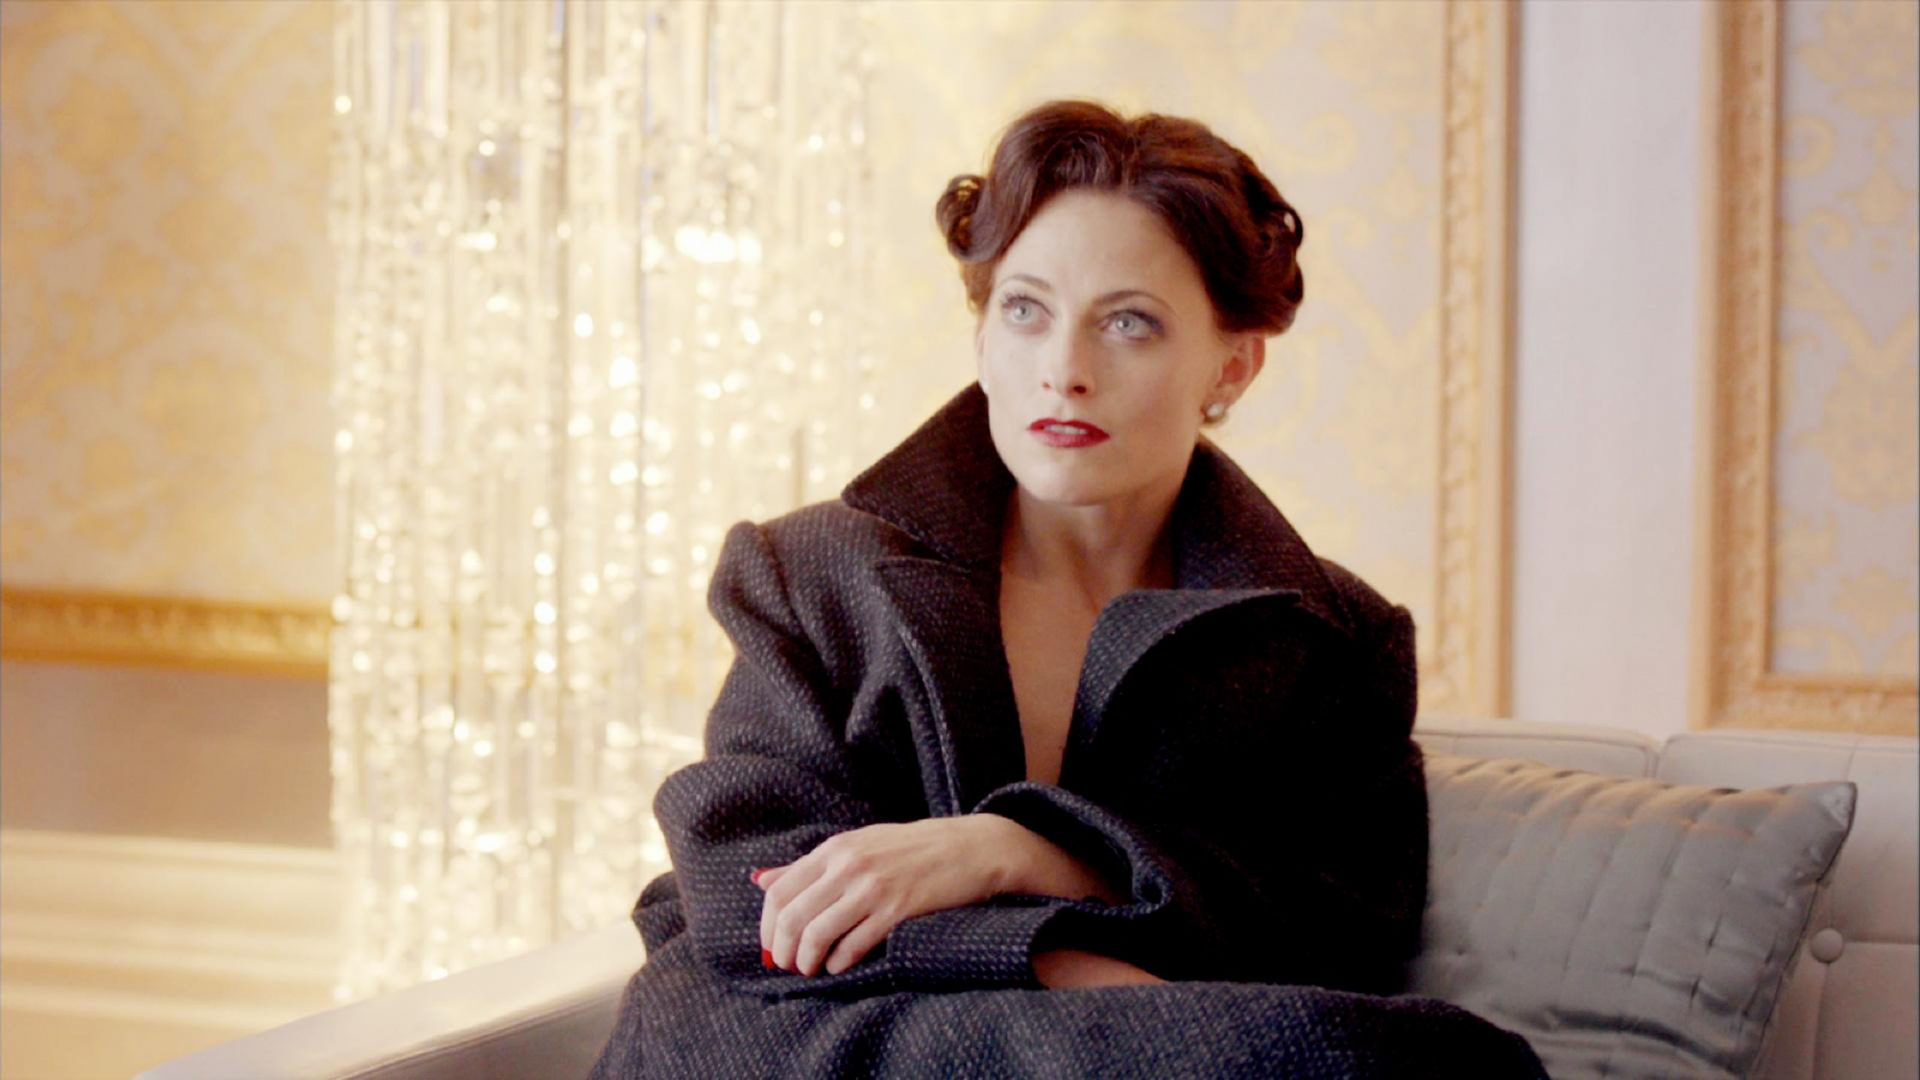 Sherlock Bbc Quotes Wallpaper Season 2 Sherlock Season 2 Lara Pulver As Irene Adler